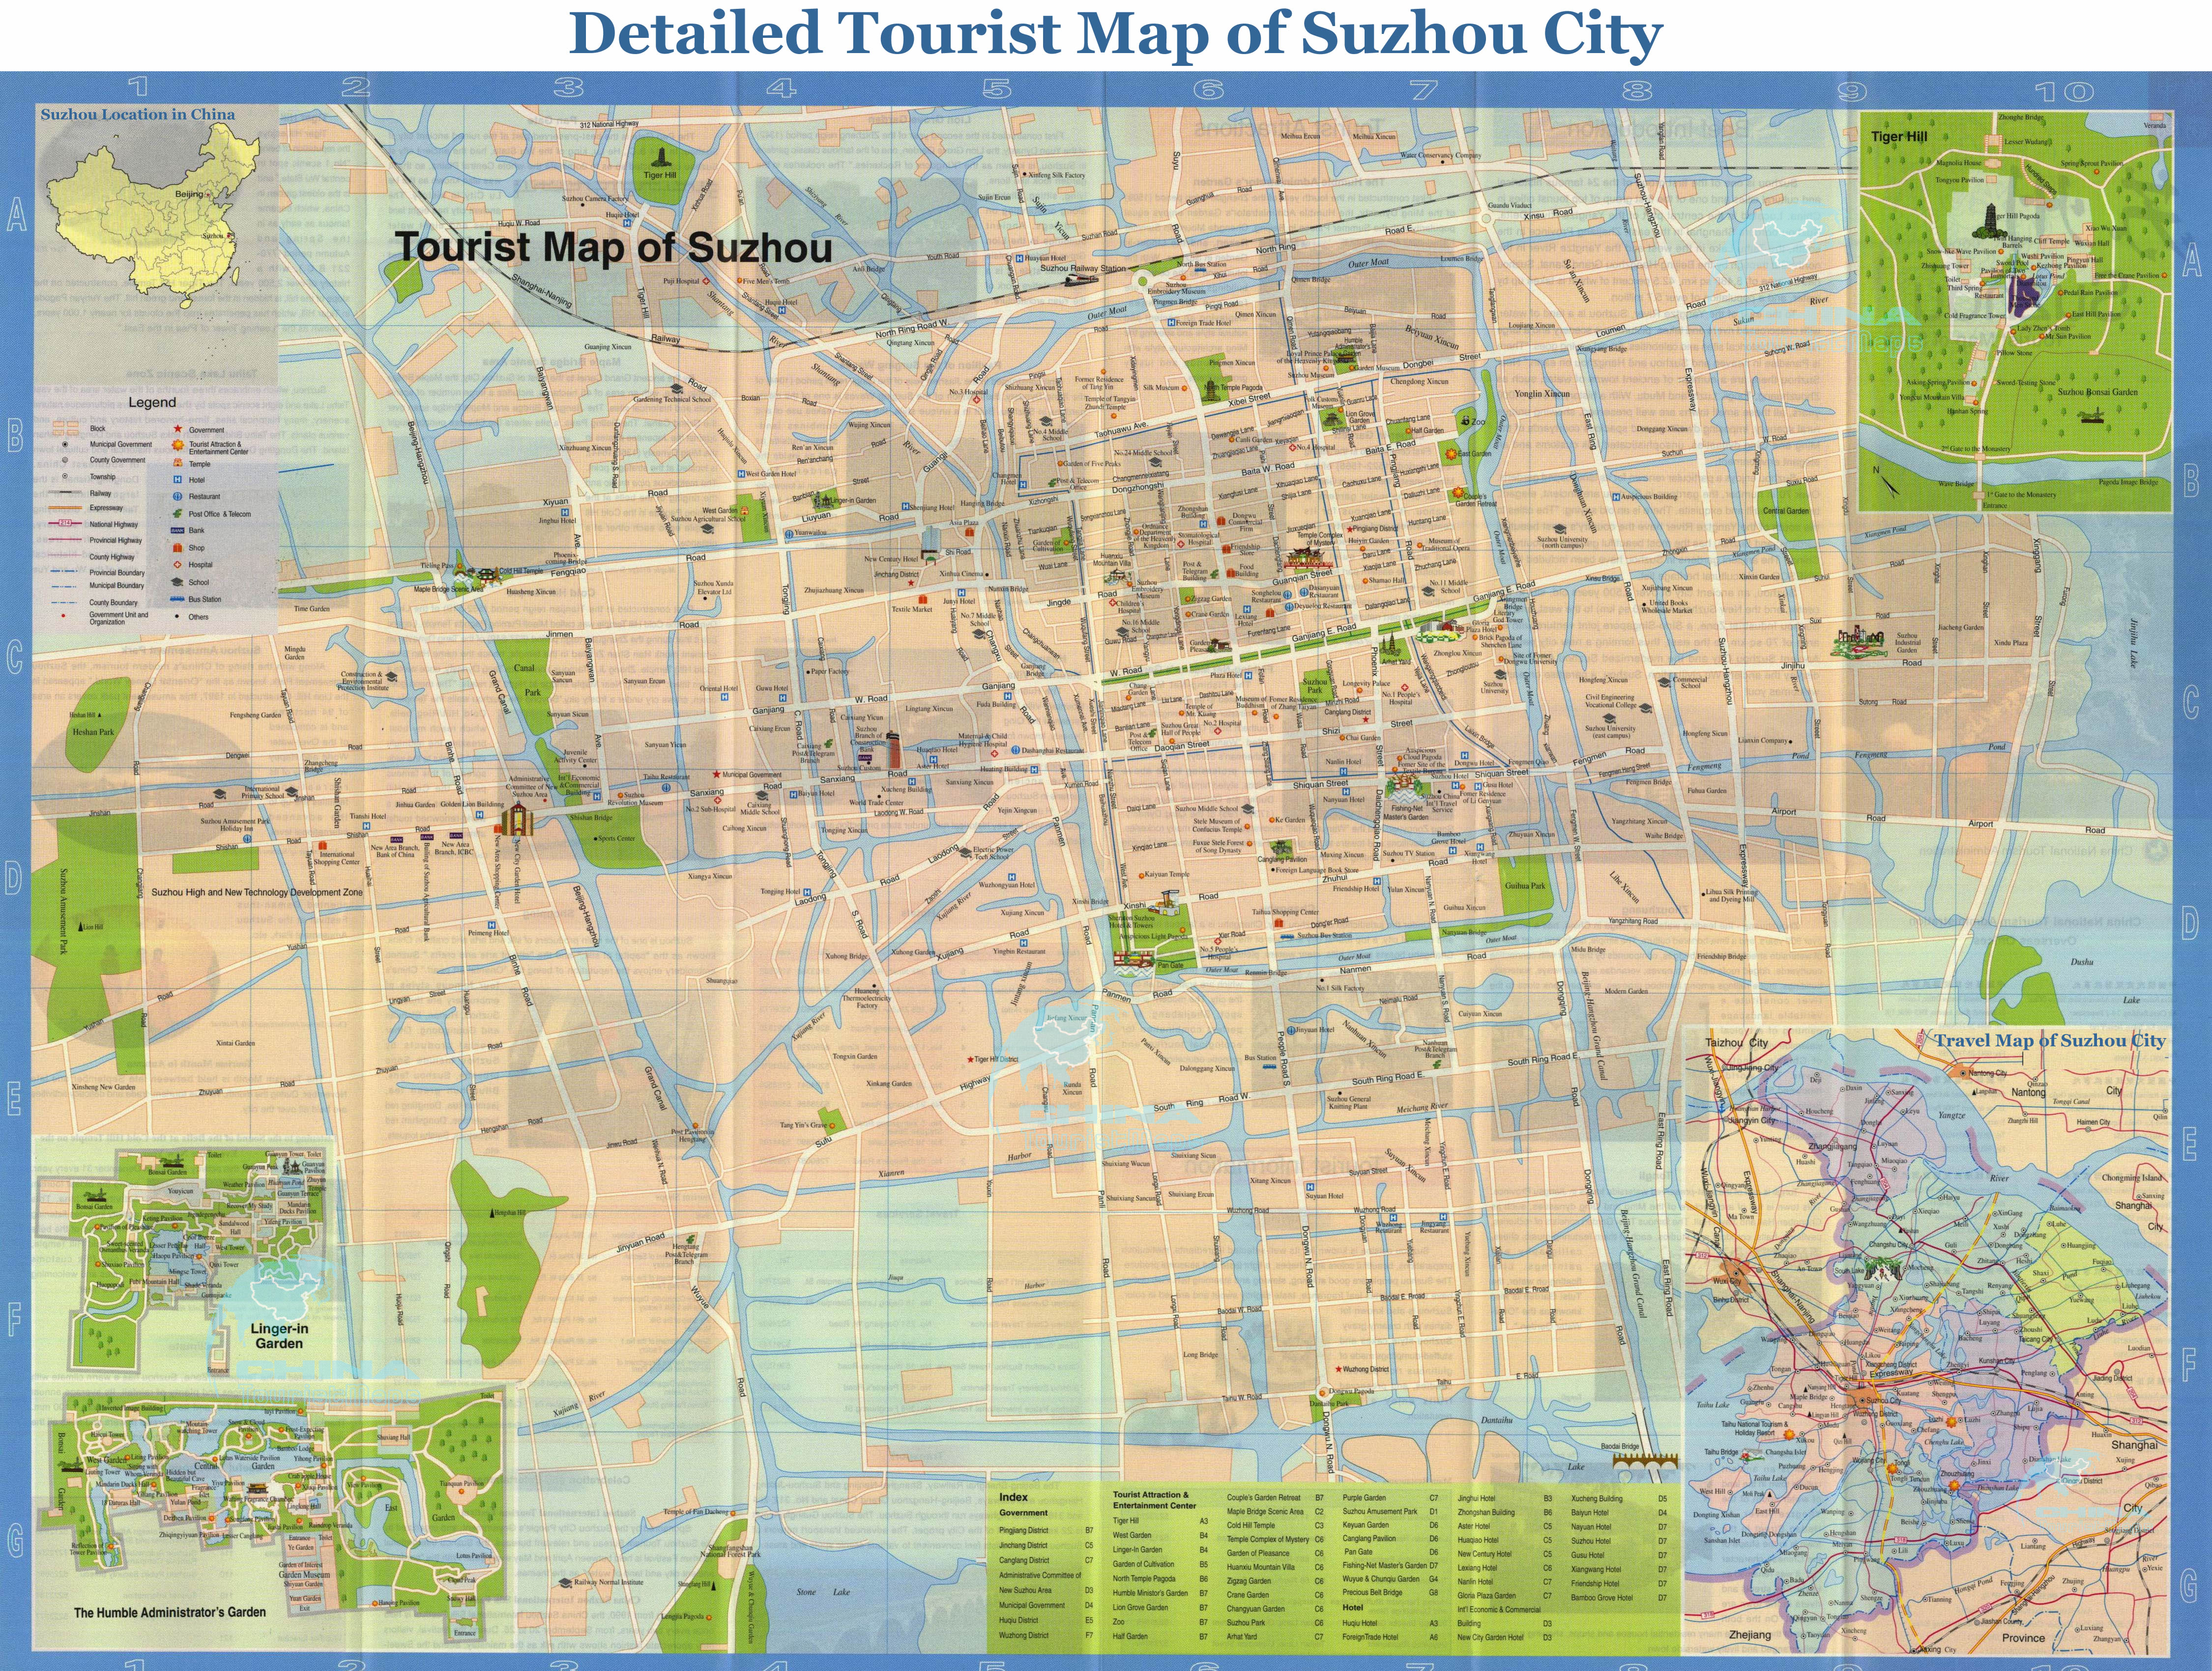 Detailed Tourist Map of Suzhou City